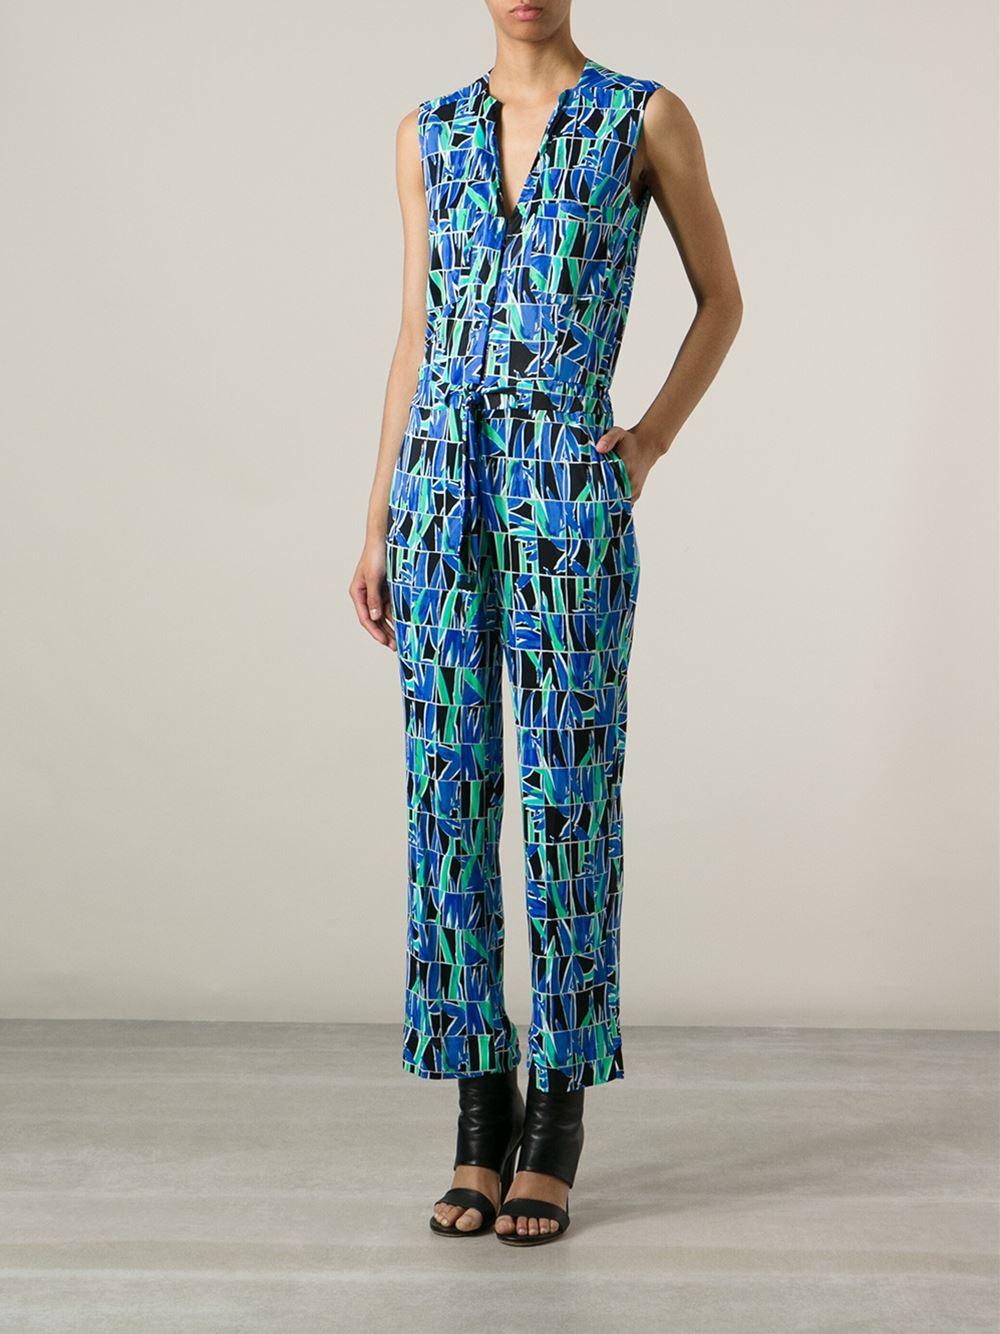 Kenzo Floral Grid Print Jumpsuit - Spazio Pritelli - Farfetch.com